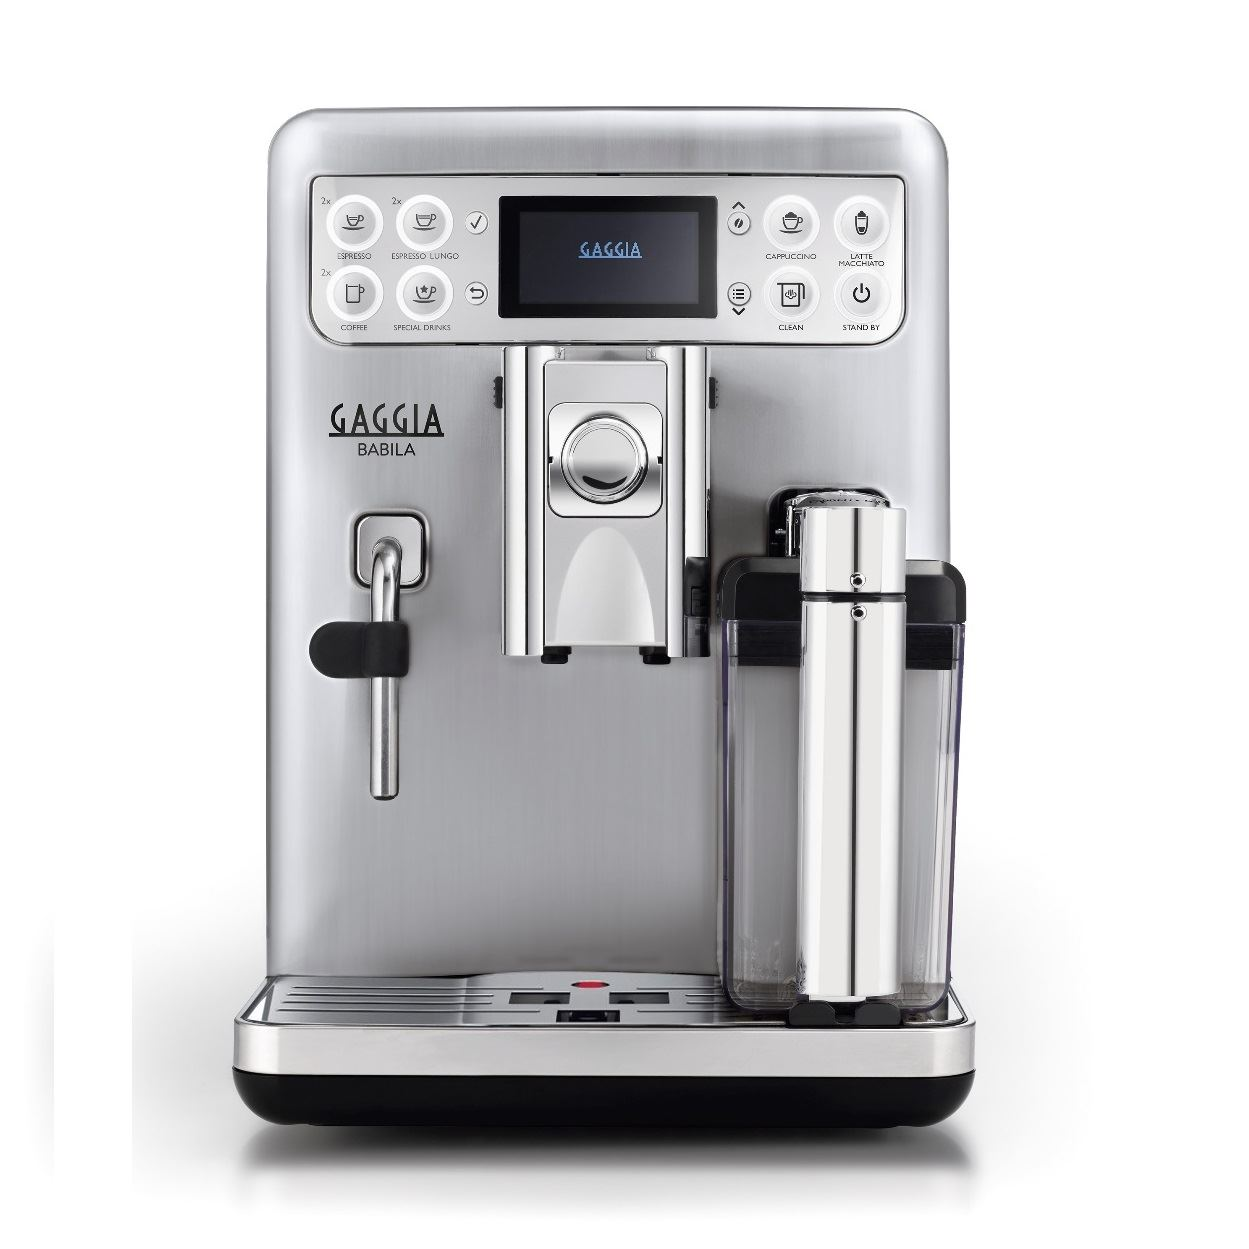 Espressor automat Gaggia Babila, 15 bari, 1.5 l, 300g, 1400W, Carafa de lapte, cafea cadou